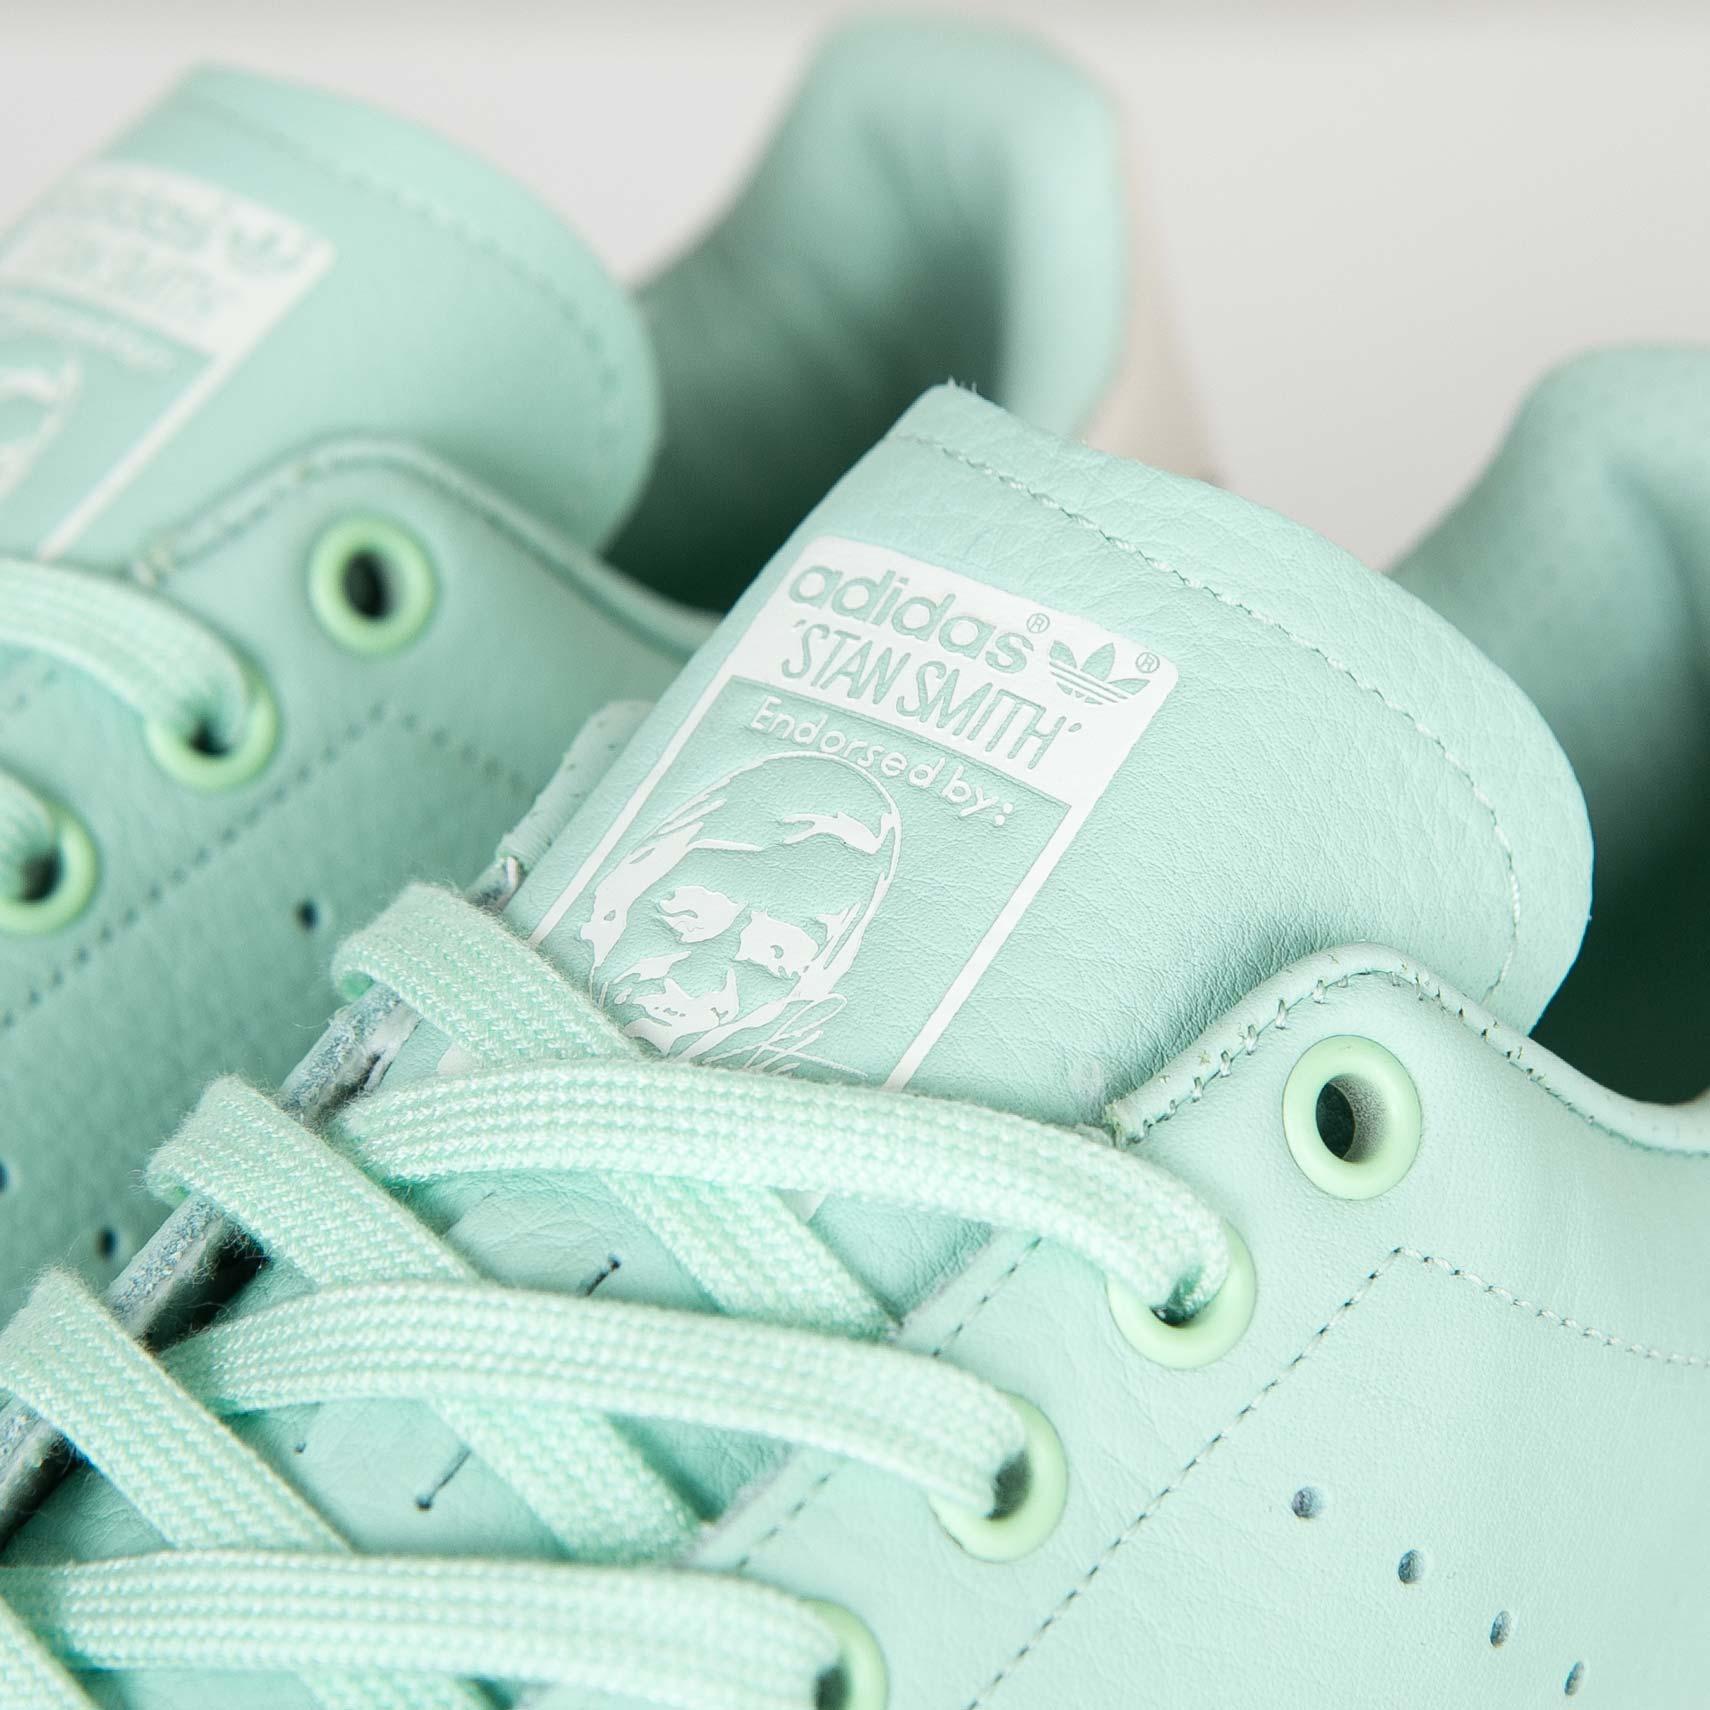 adidas Stan Smith - S79301 - Sneakersnstuff | sneakers ...